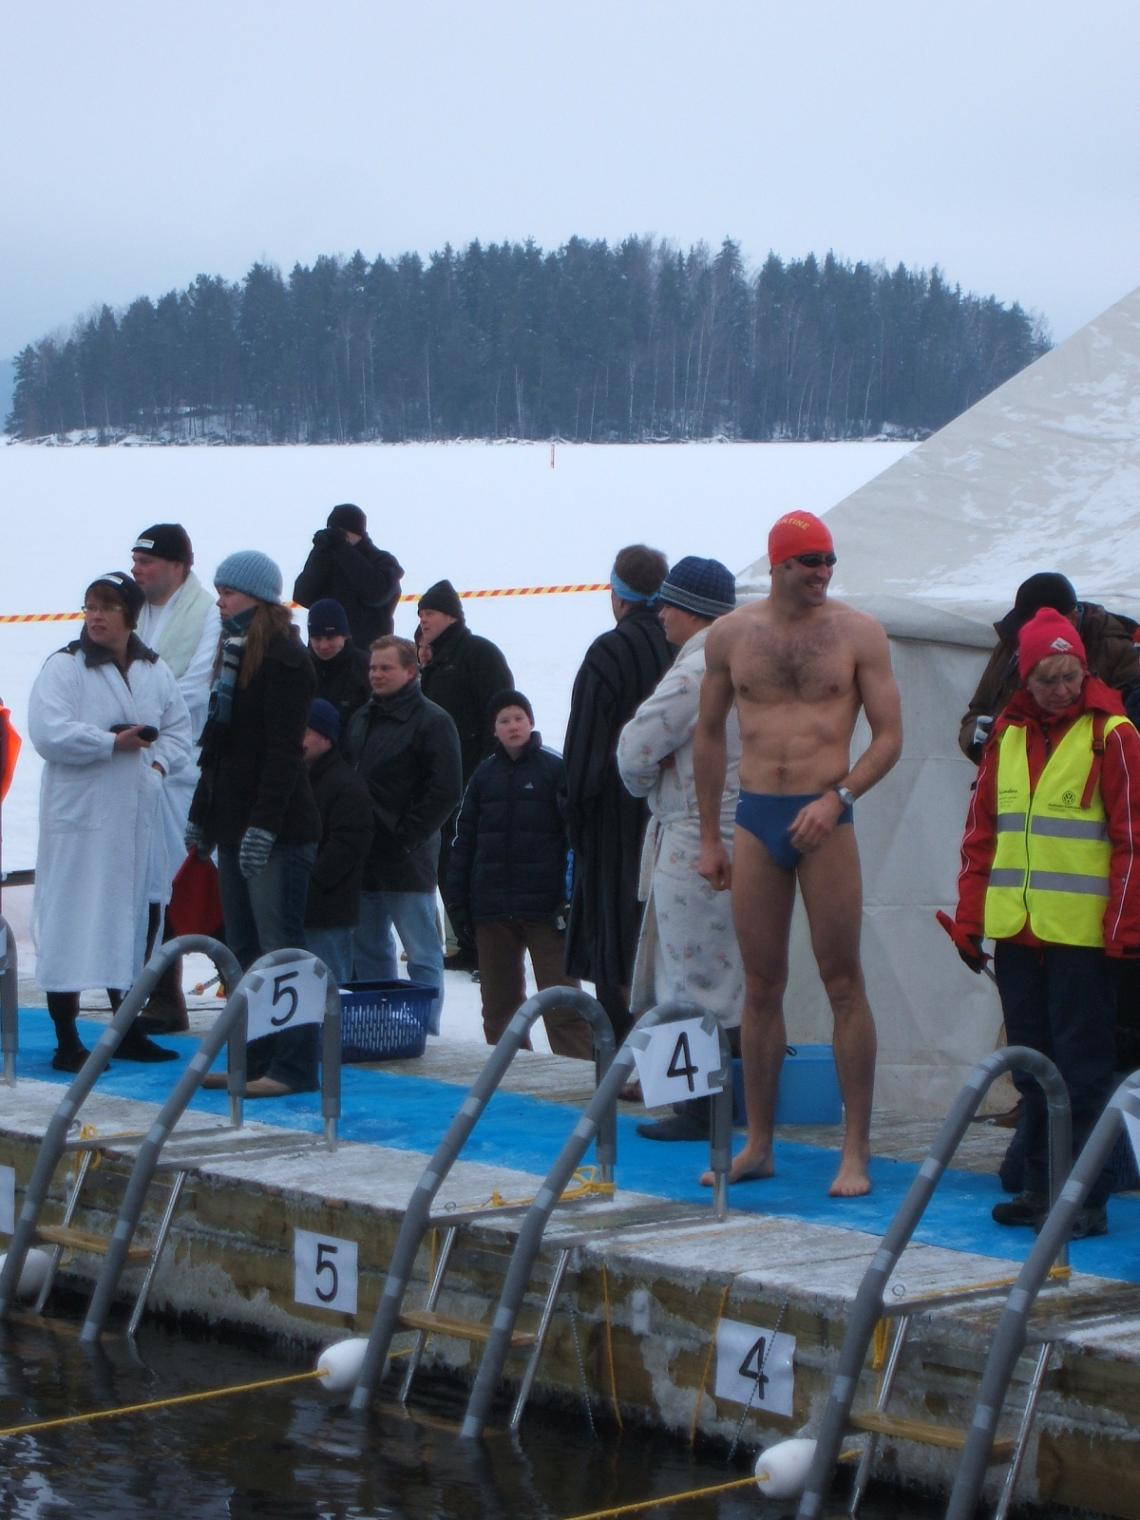 Finland, February 2007